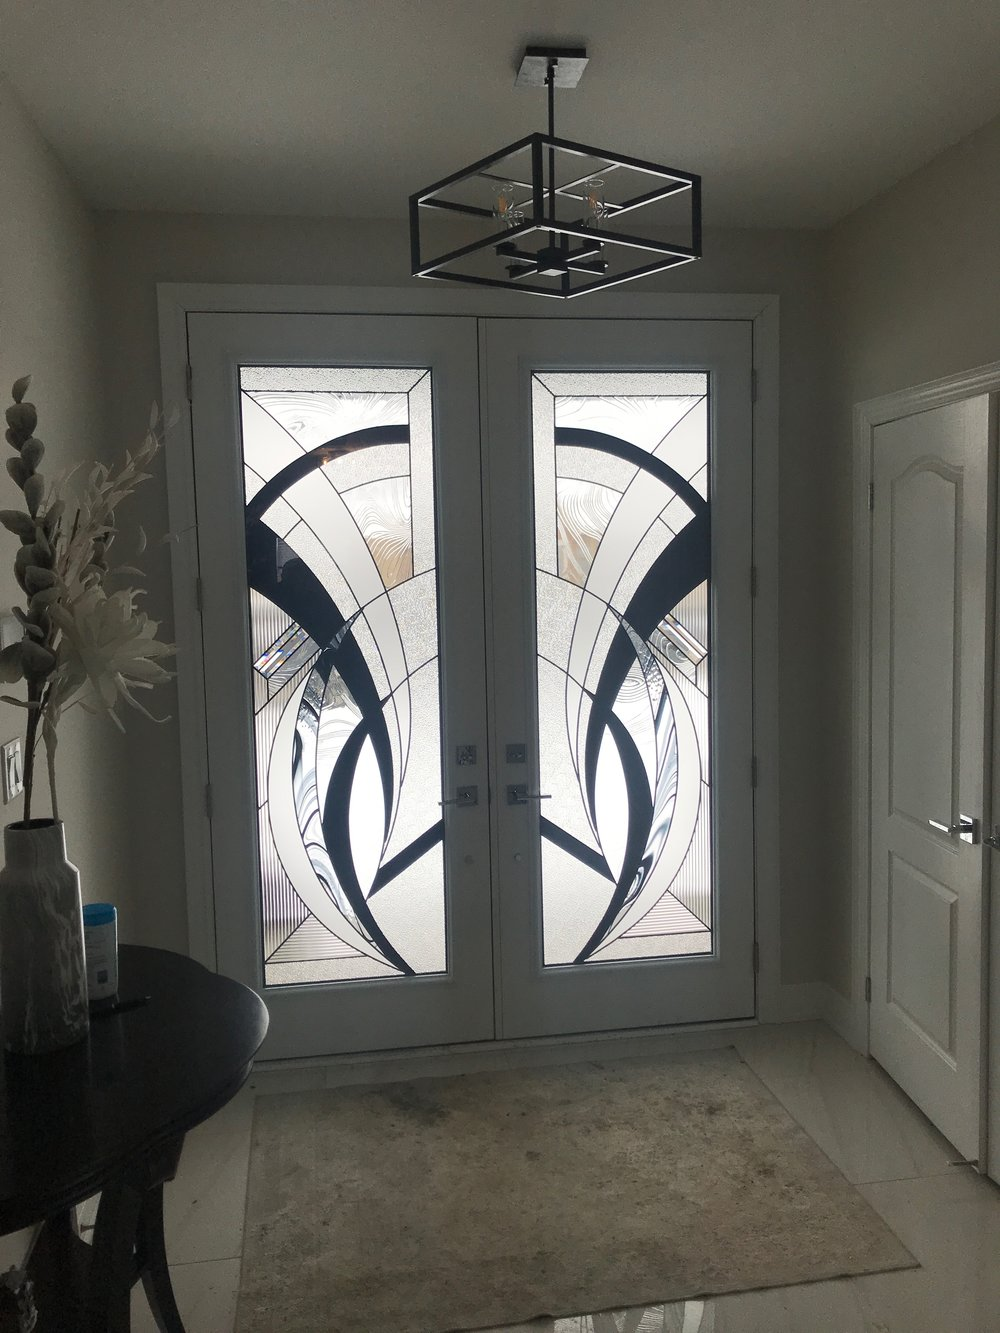 Atlas-decorative-glass-door-inserts-installation-Barrie-Onatrio